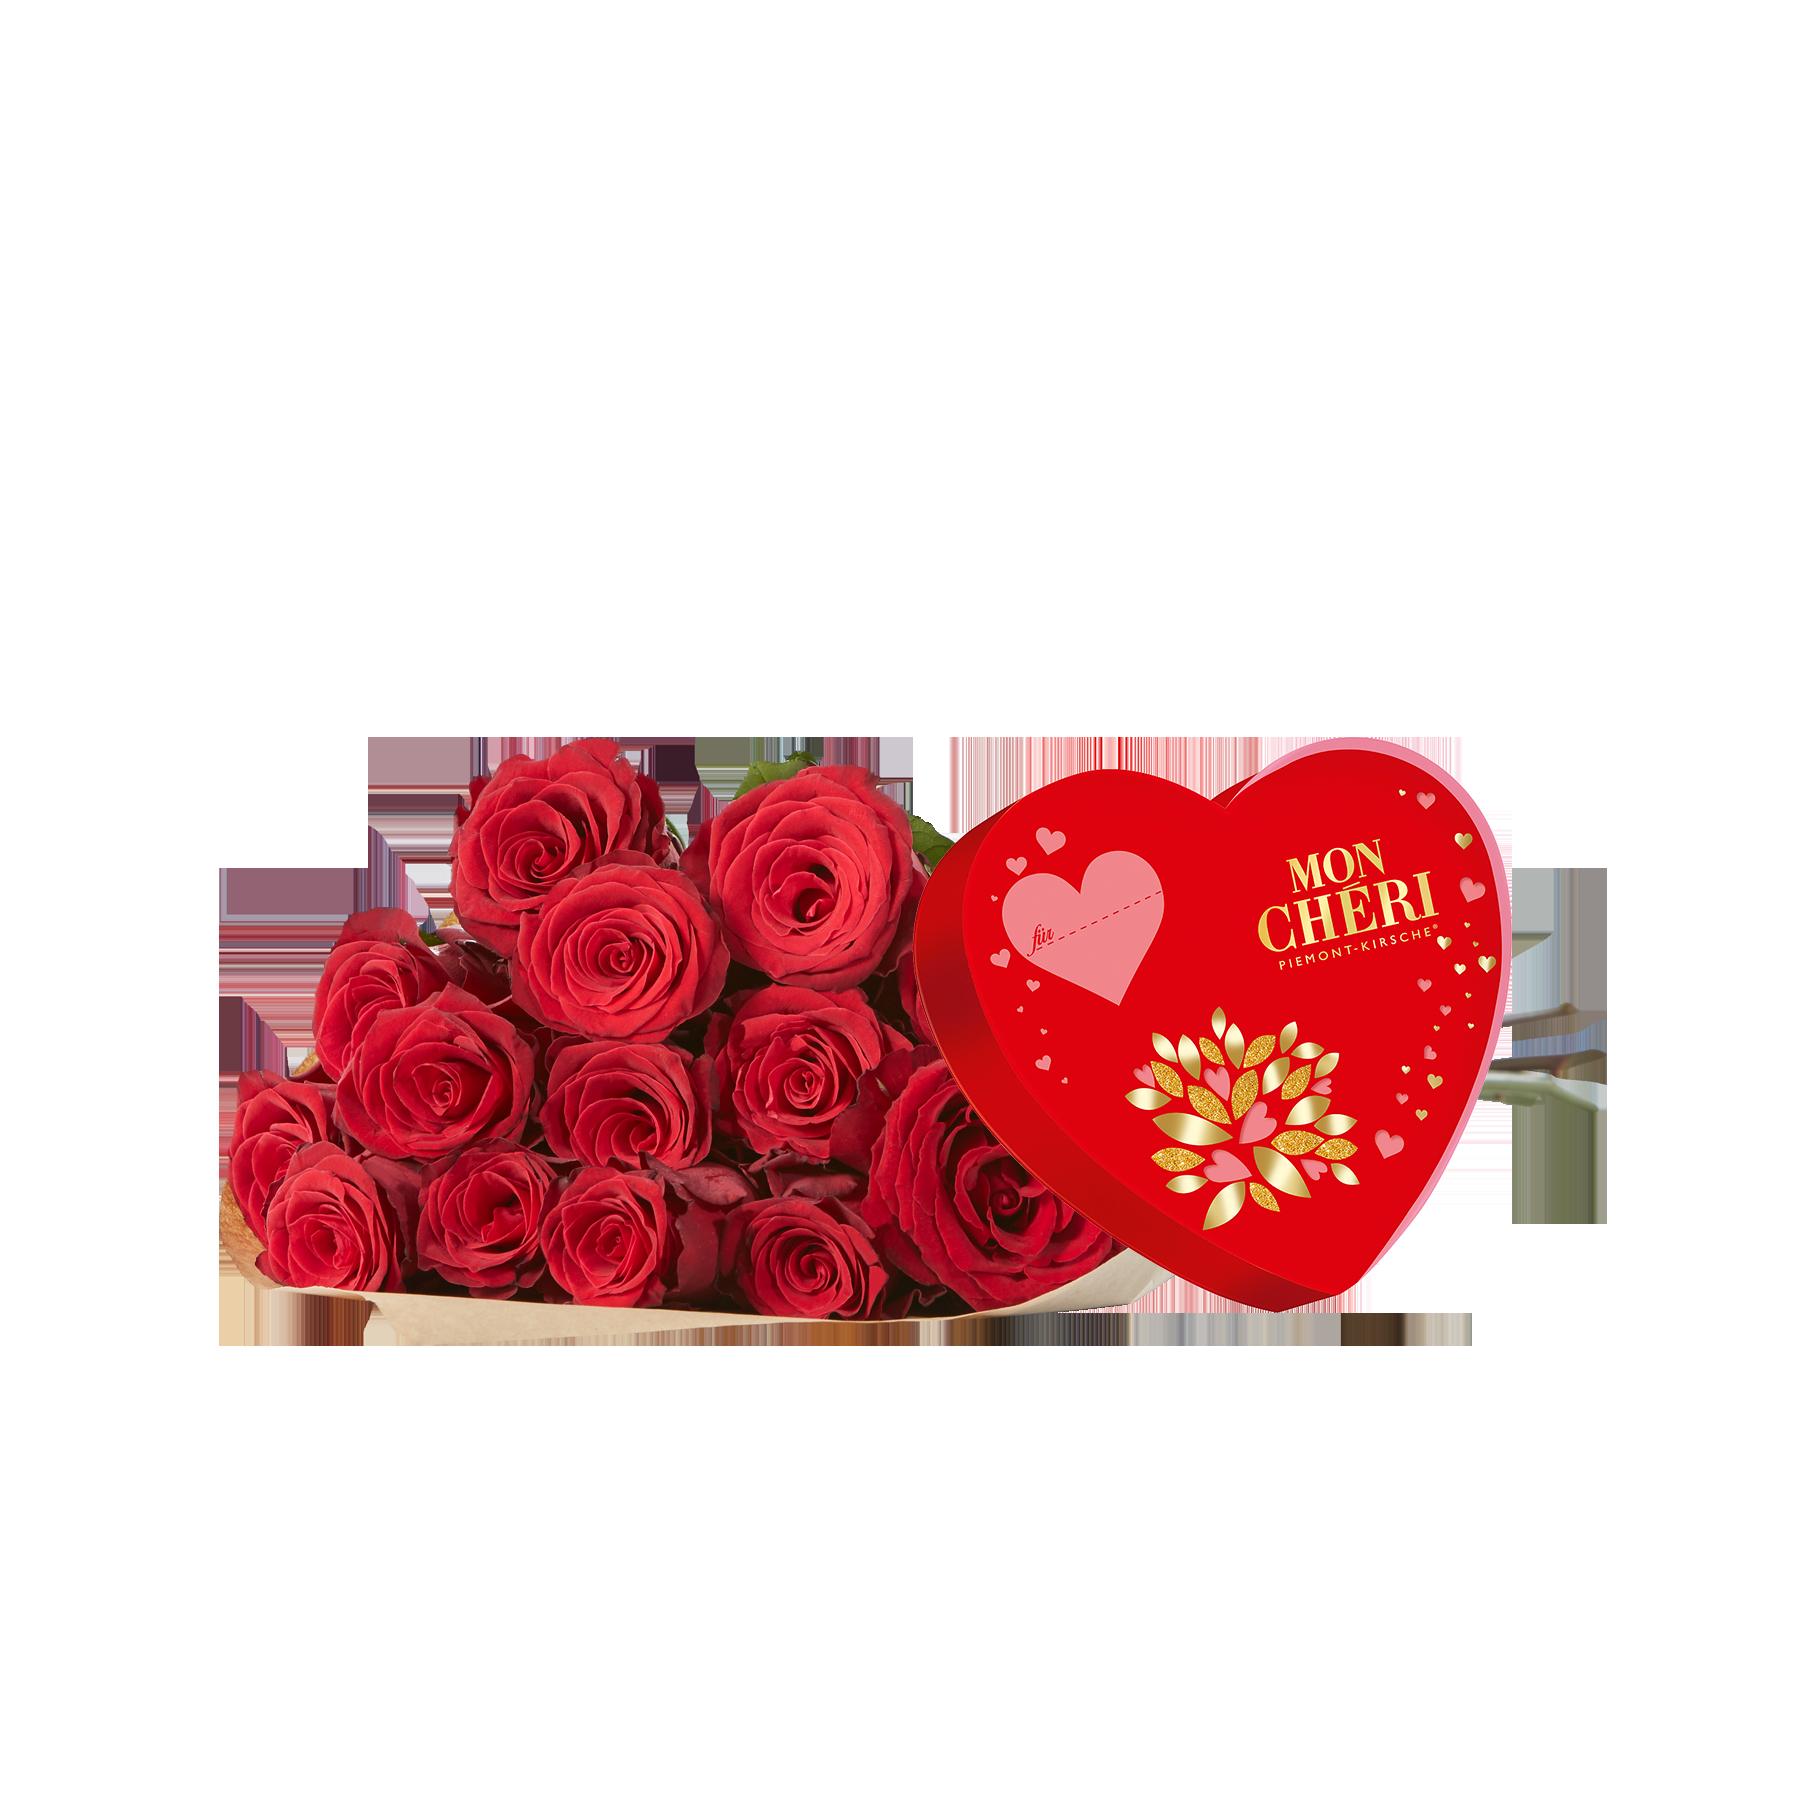 #20 Rosen Red Ribbon mit Mon Chéri Herz#